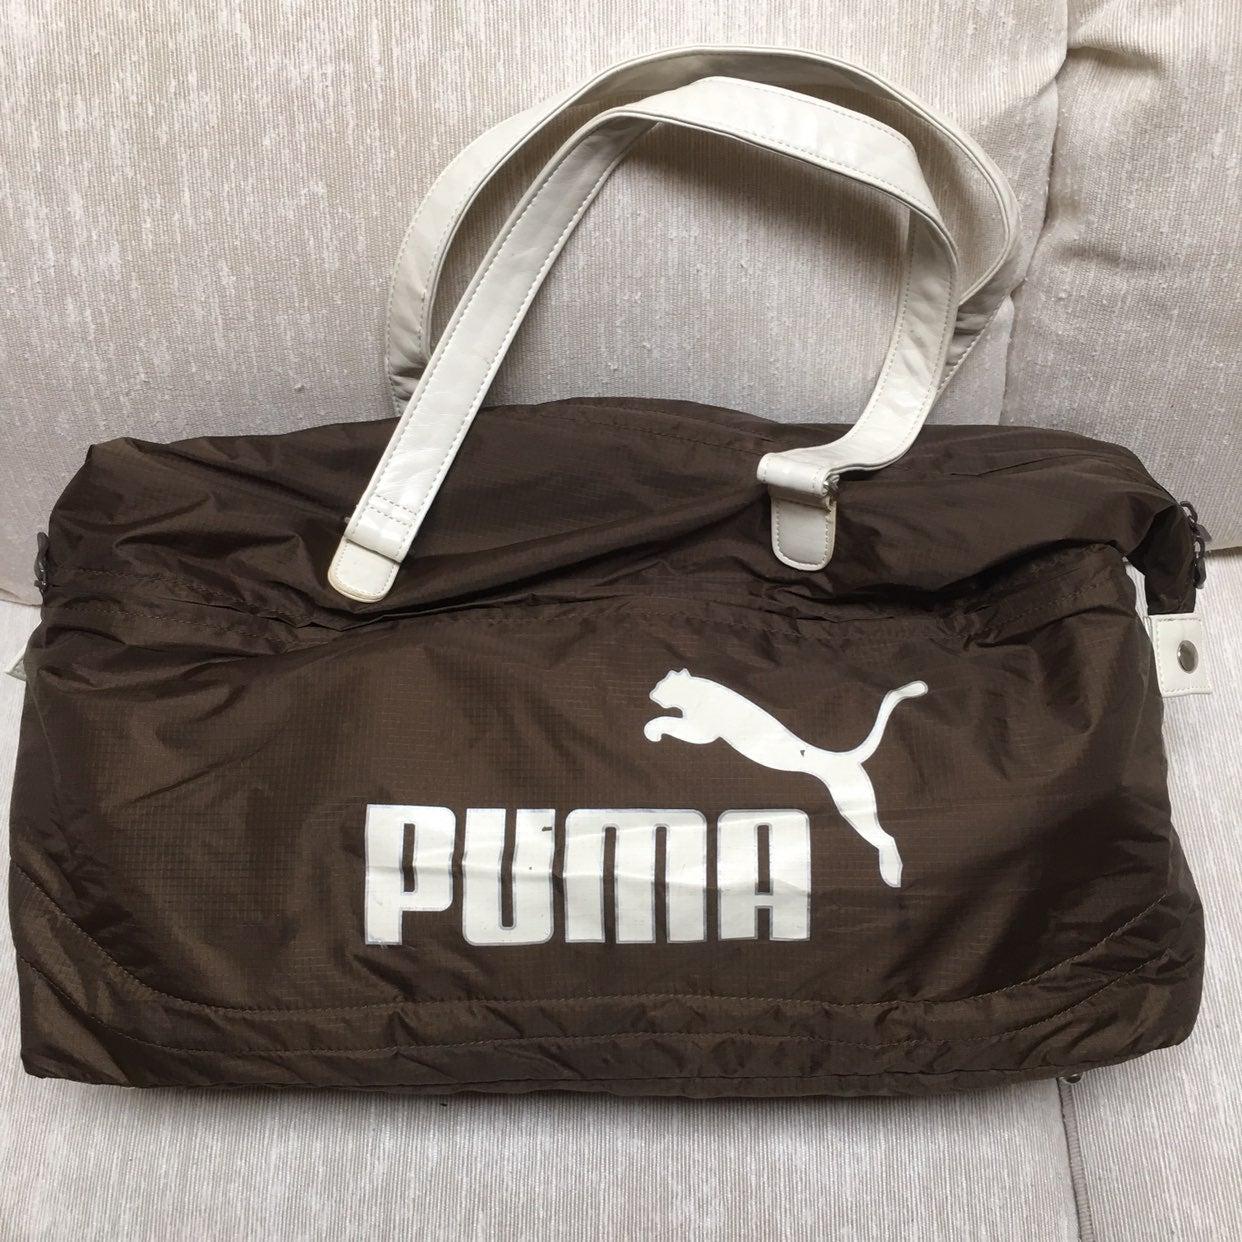 Puma Duffle Bag Brown With White Logo